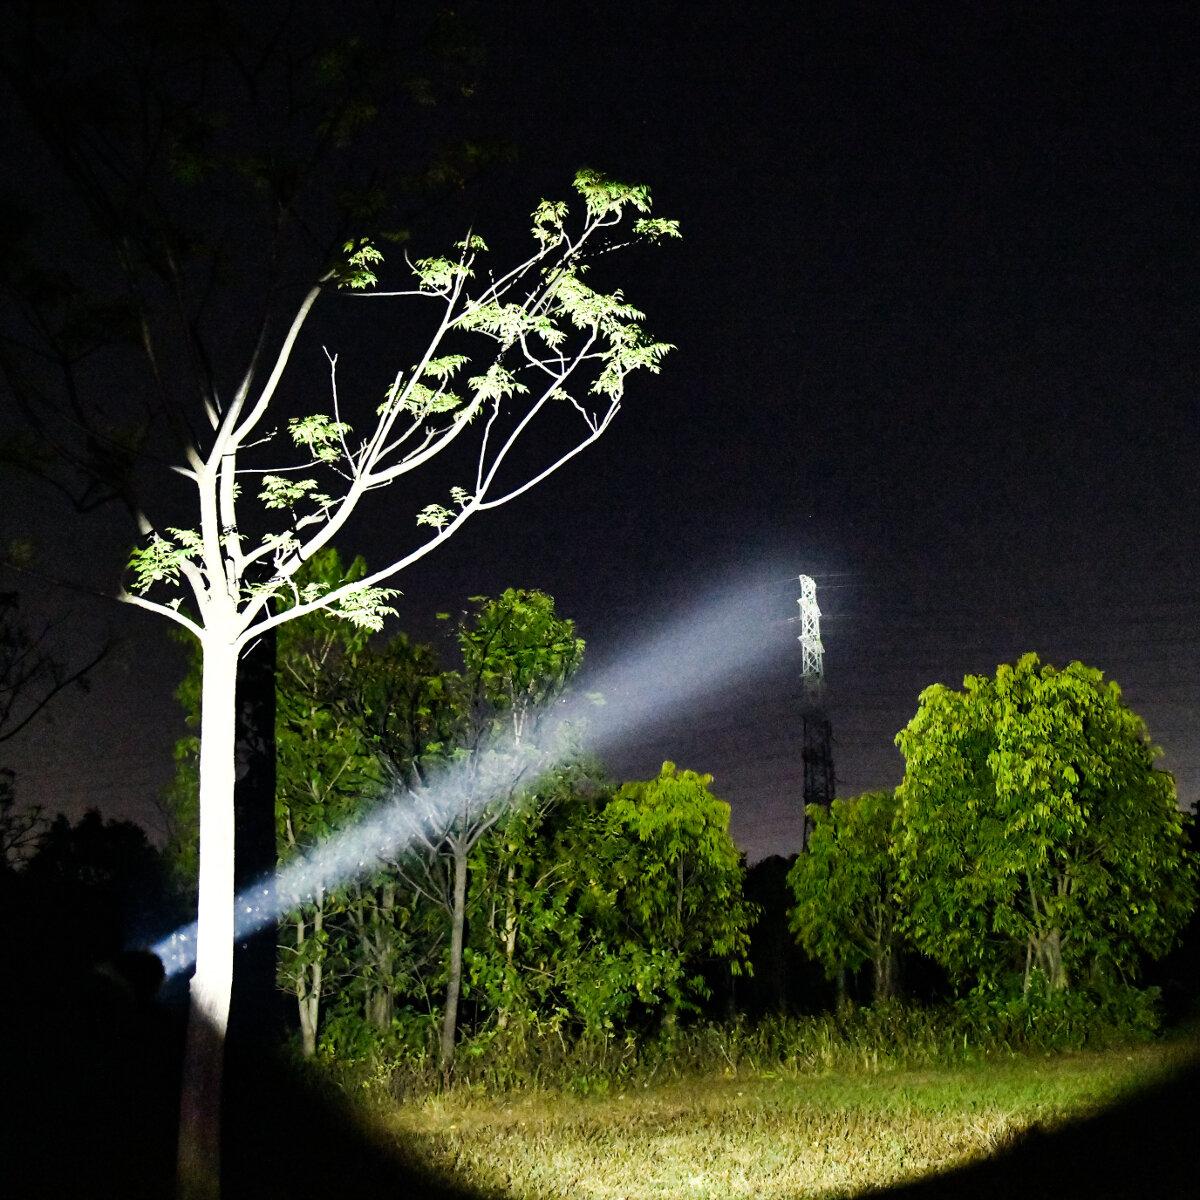 Astrolux® FT03S SBT90.2 4500lm Anduril UI 1428m Long Thrower King Powerful LED Flashlight Long Range Long Throw 21700 26650 18650 Flashlight Torch - 5